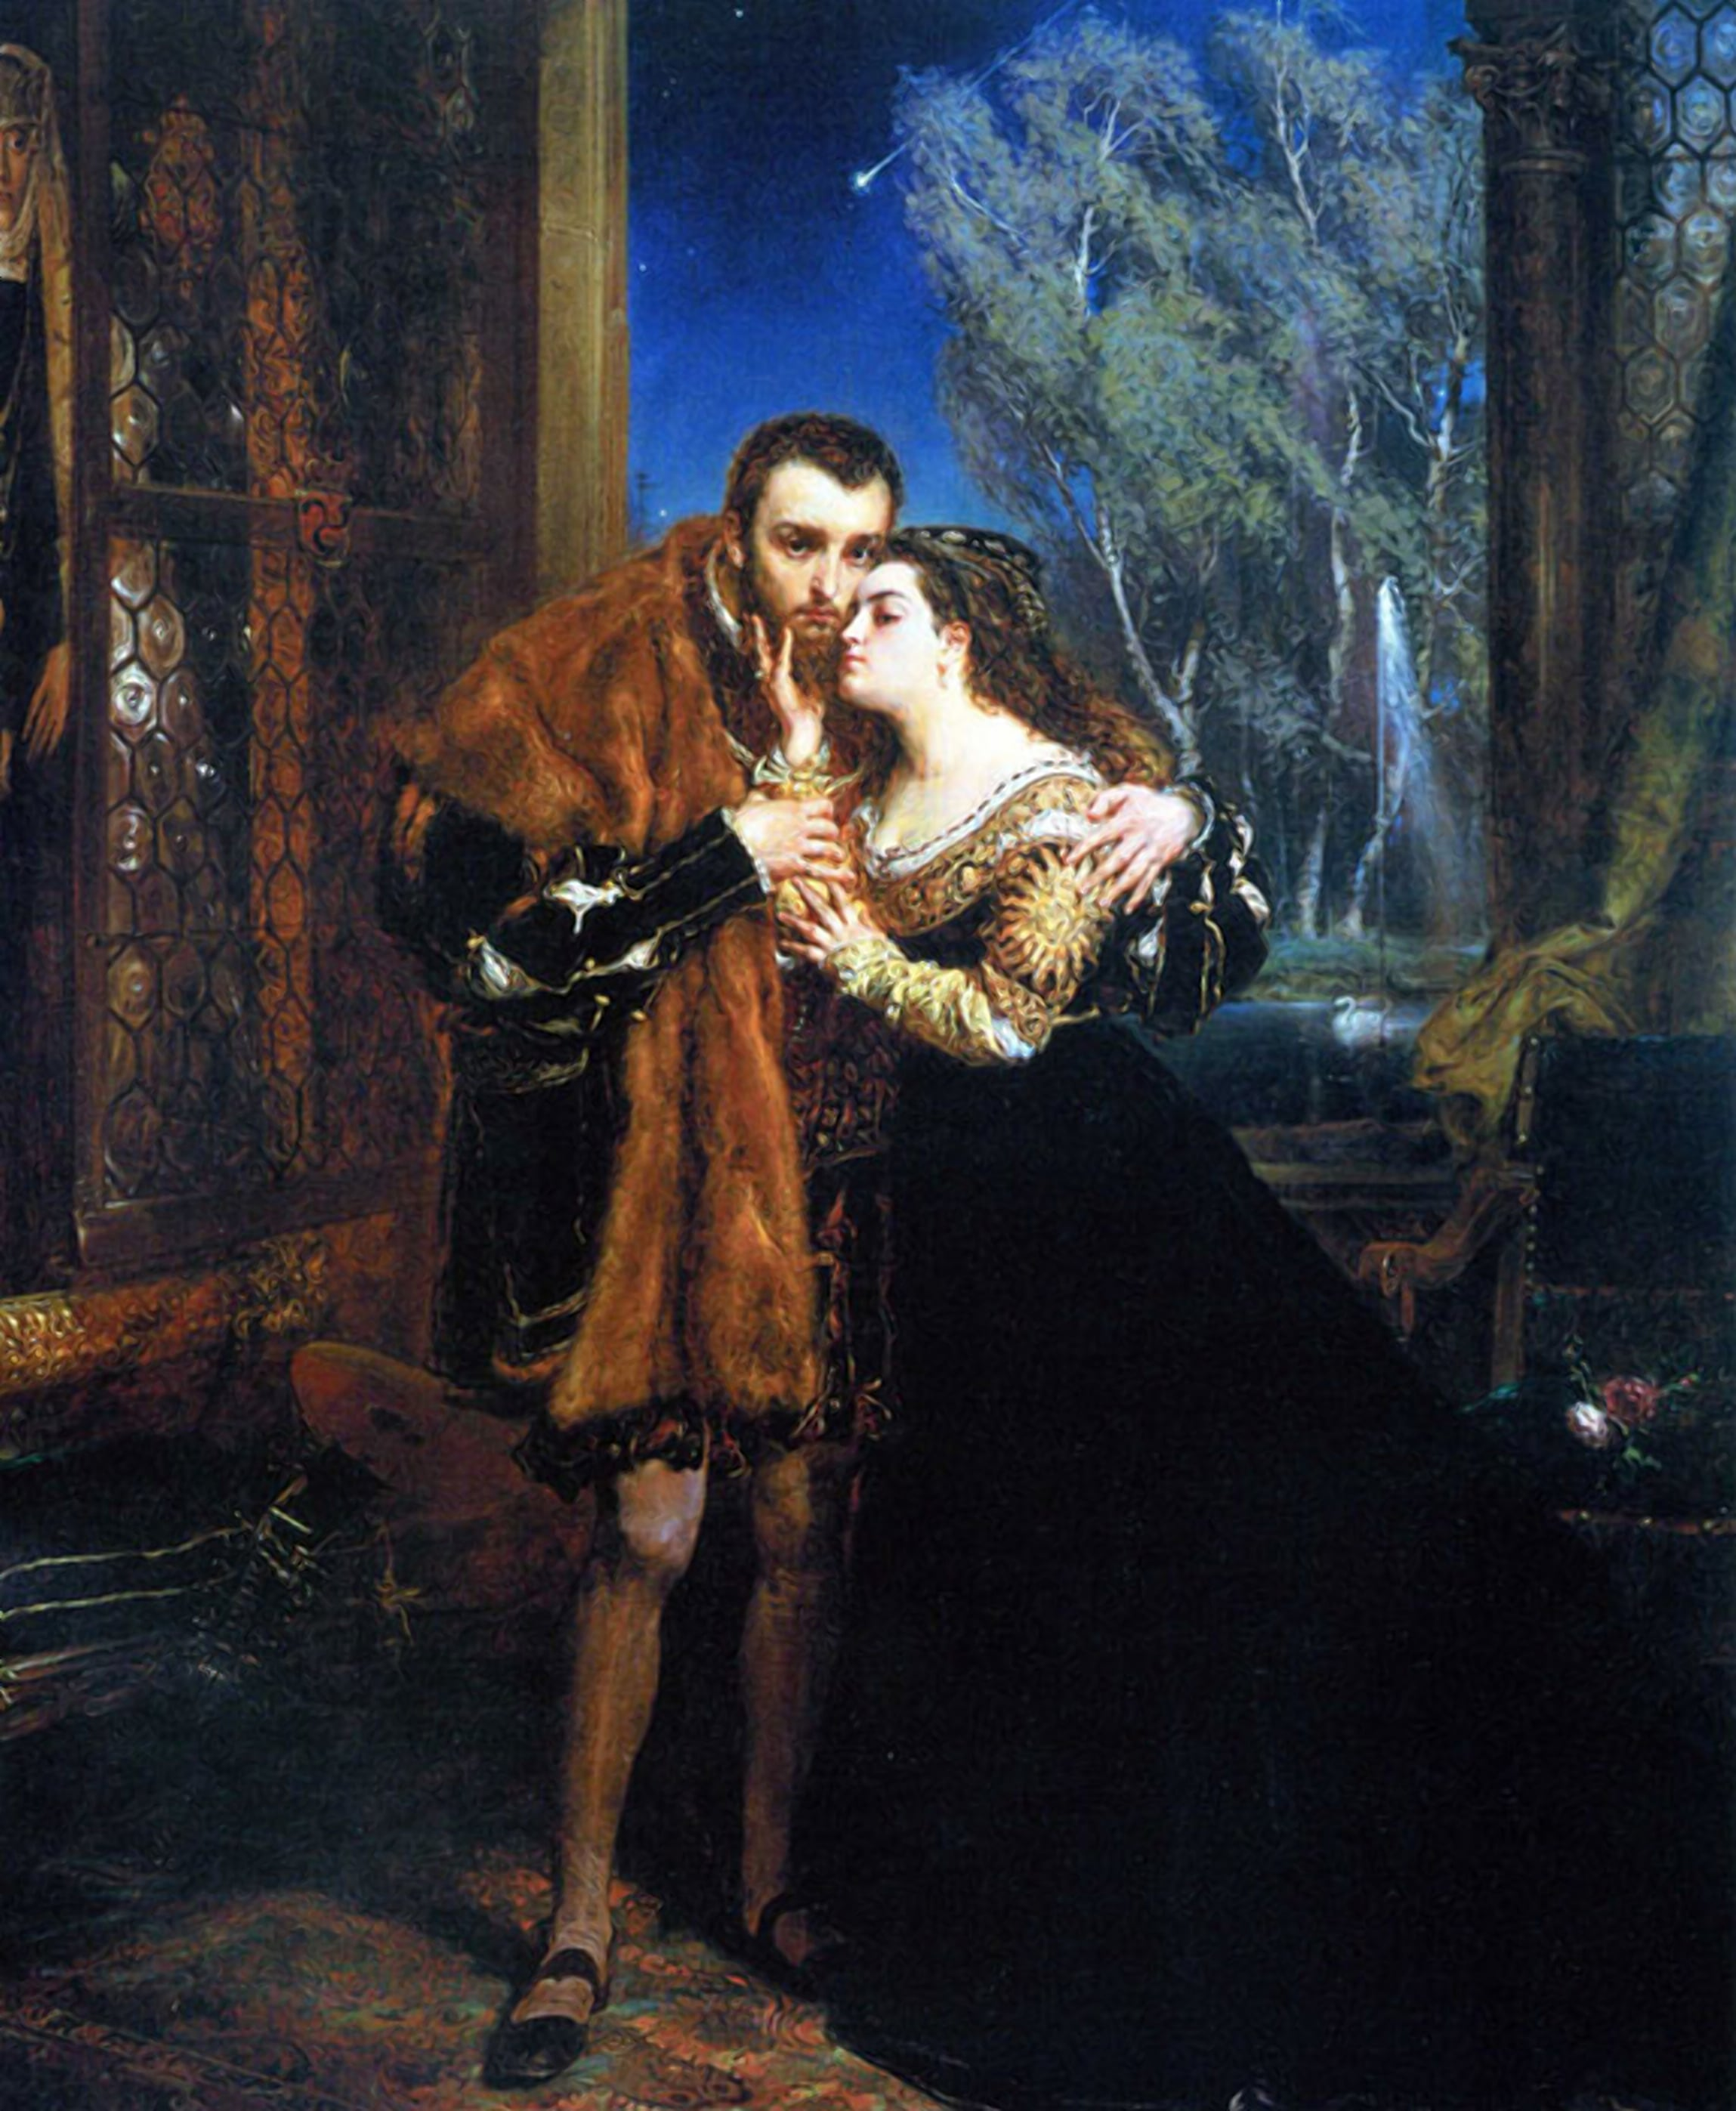 Барбара Радзивилл и Жигимонт II Август